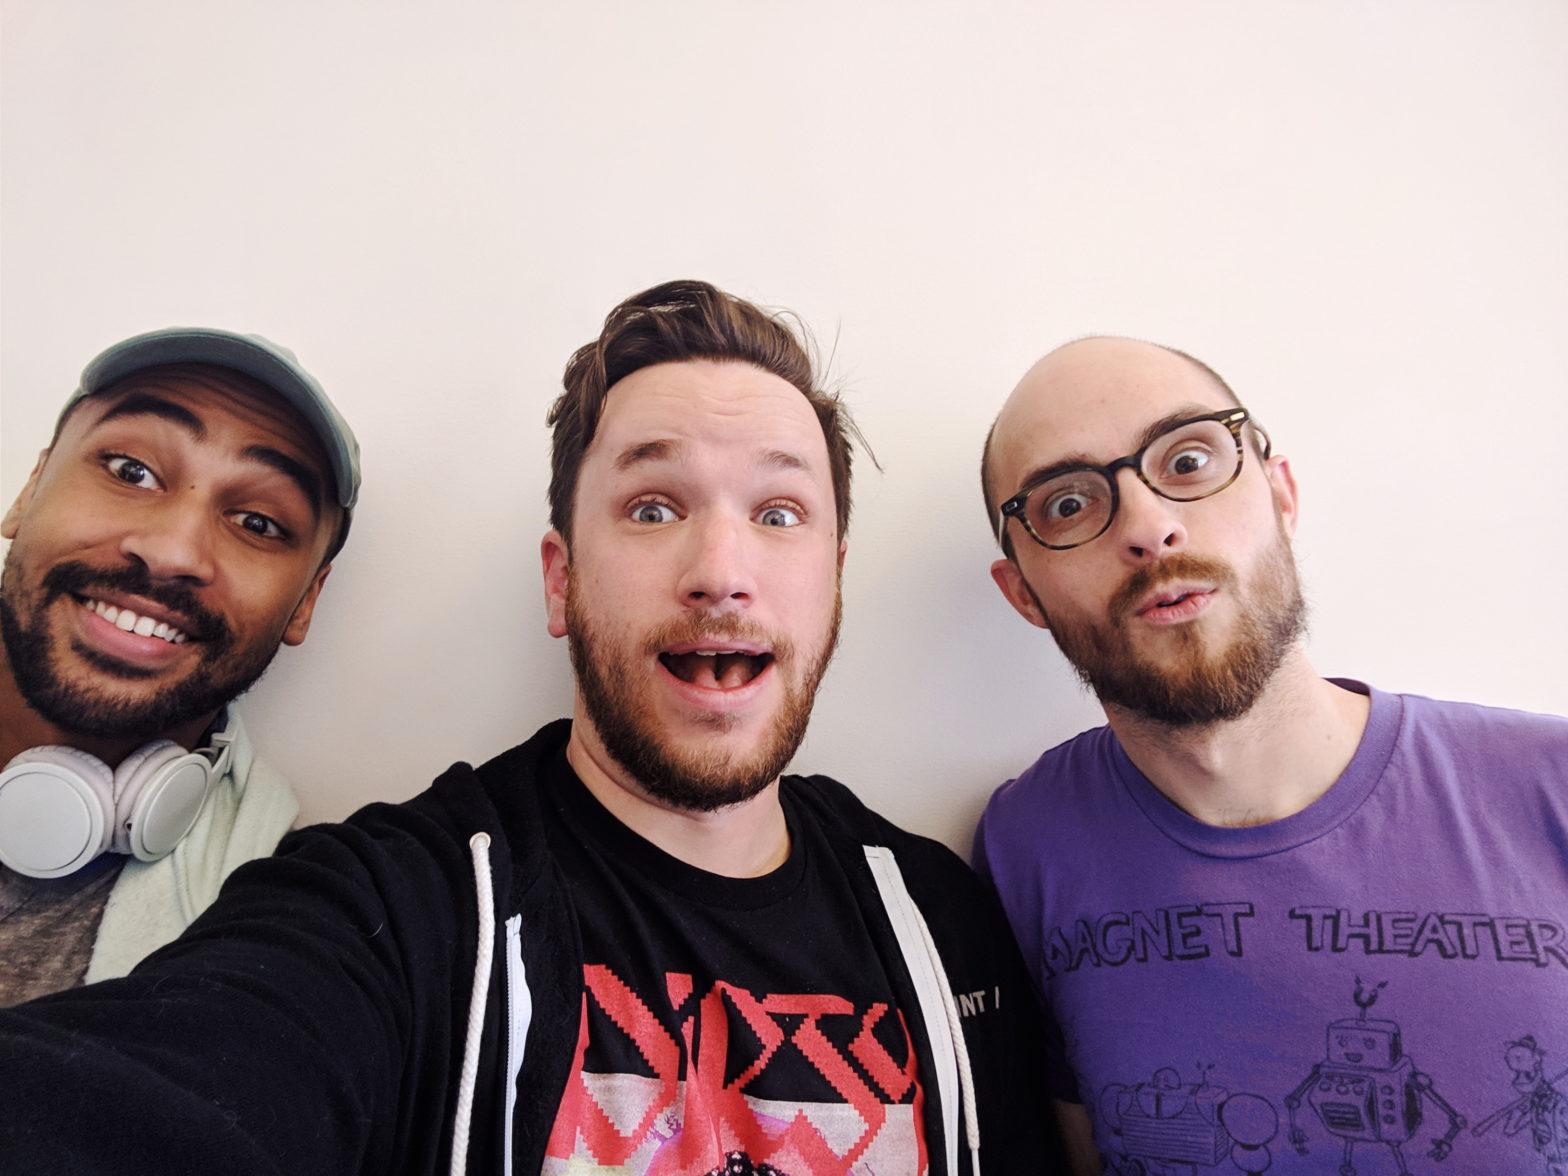 Michael Stevens, Patrick Cartelli, and Evan Forde Barden taking a selfie together